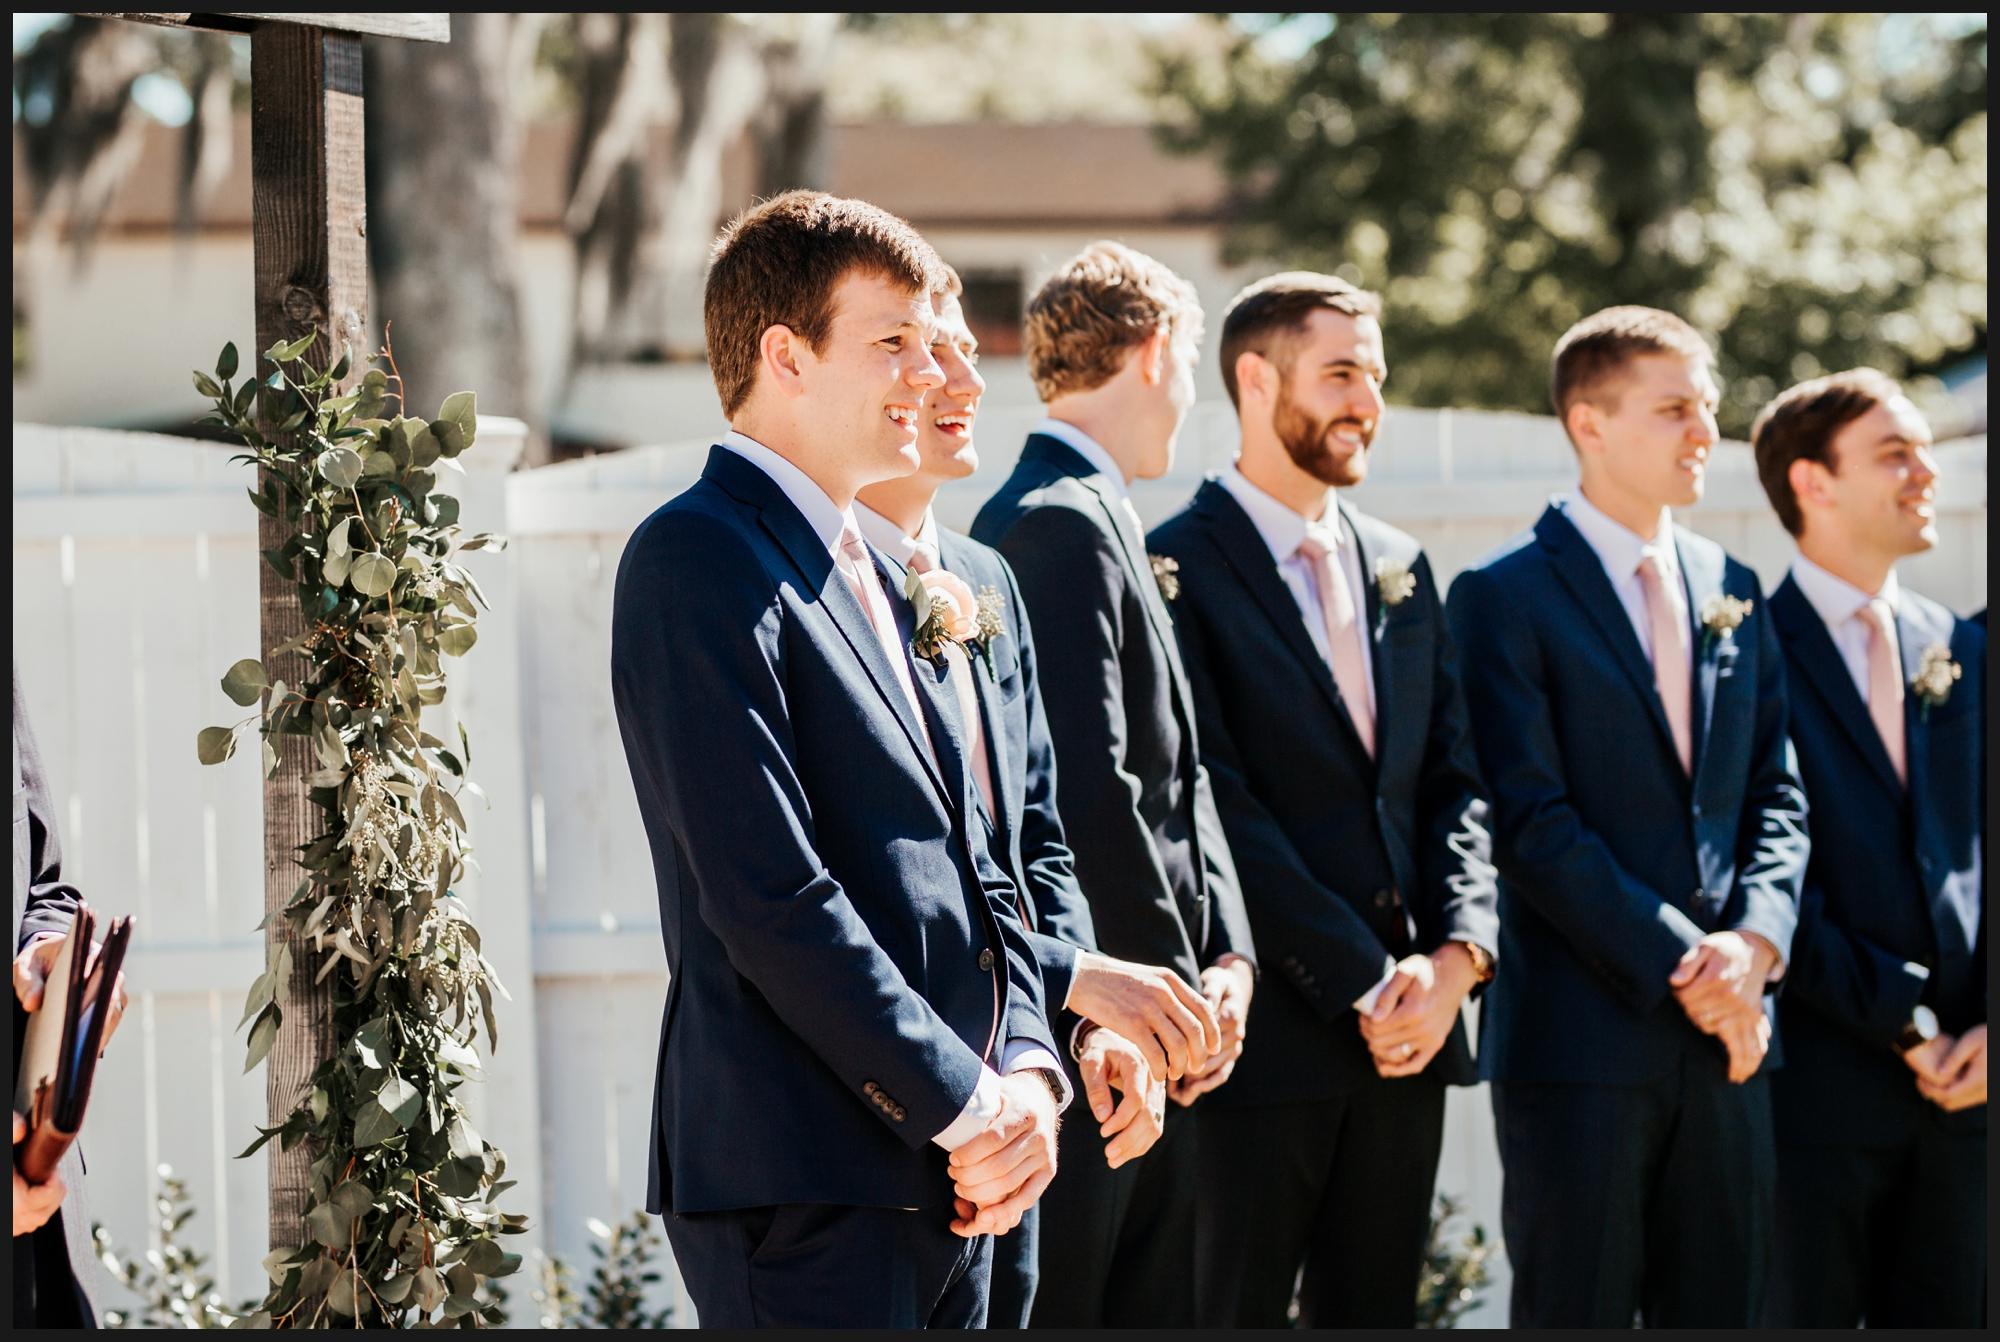 Orlando-Wedding-Photographer-destination-wedding-photographer-florida-wedding-photographer-bohemian-wedding-photographer_1744.jpg